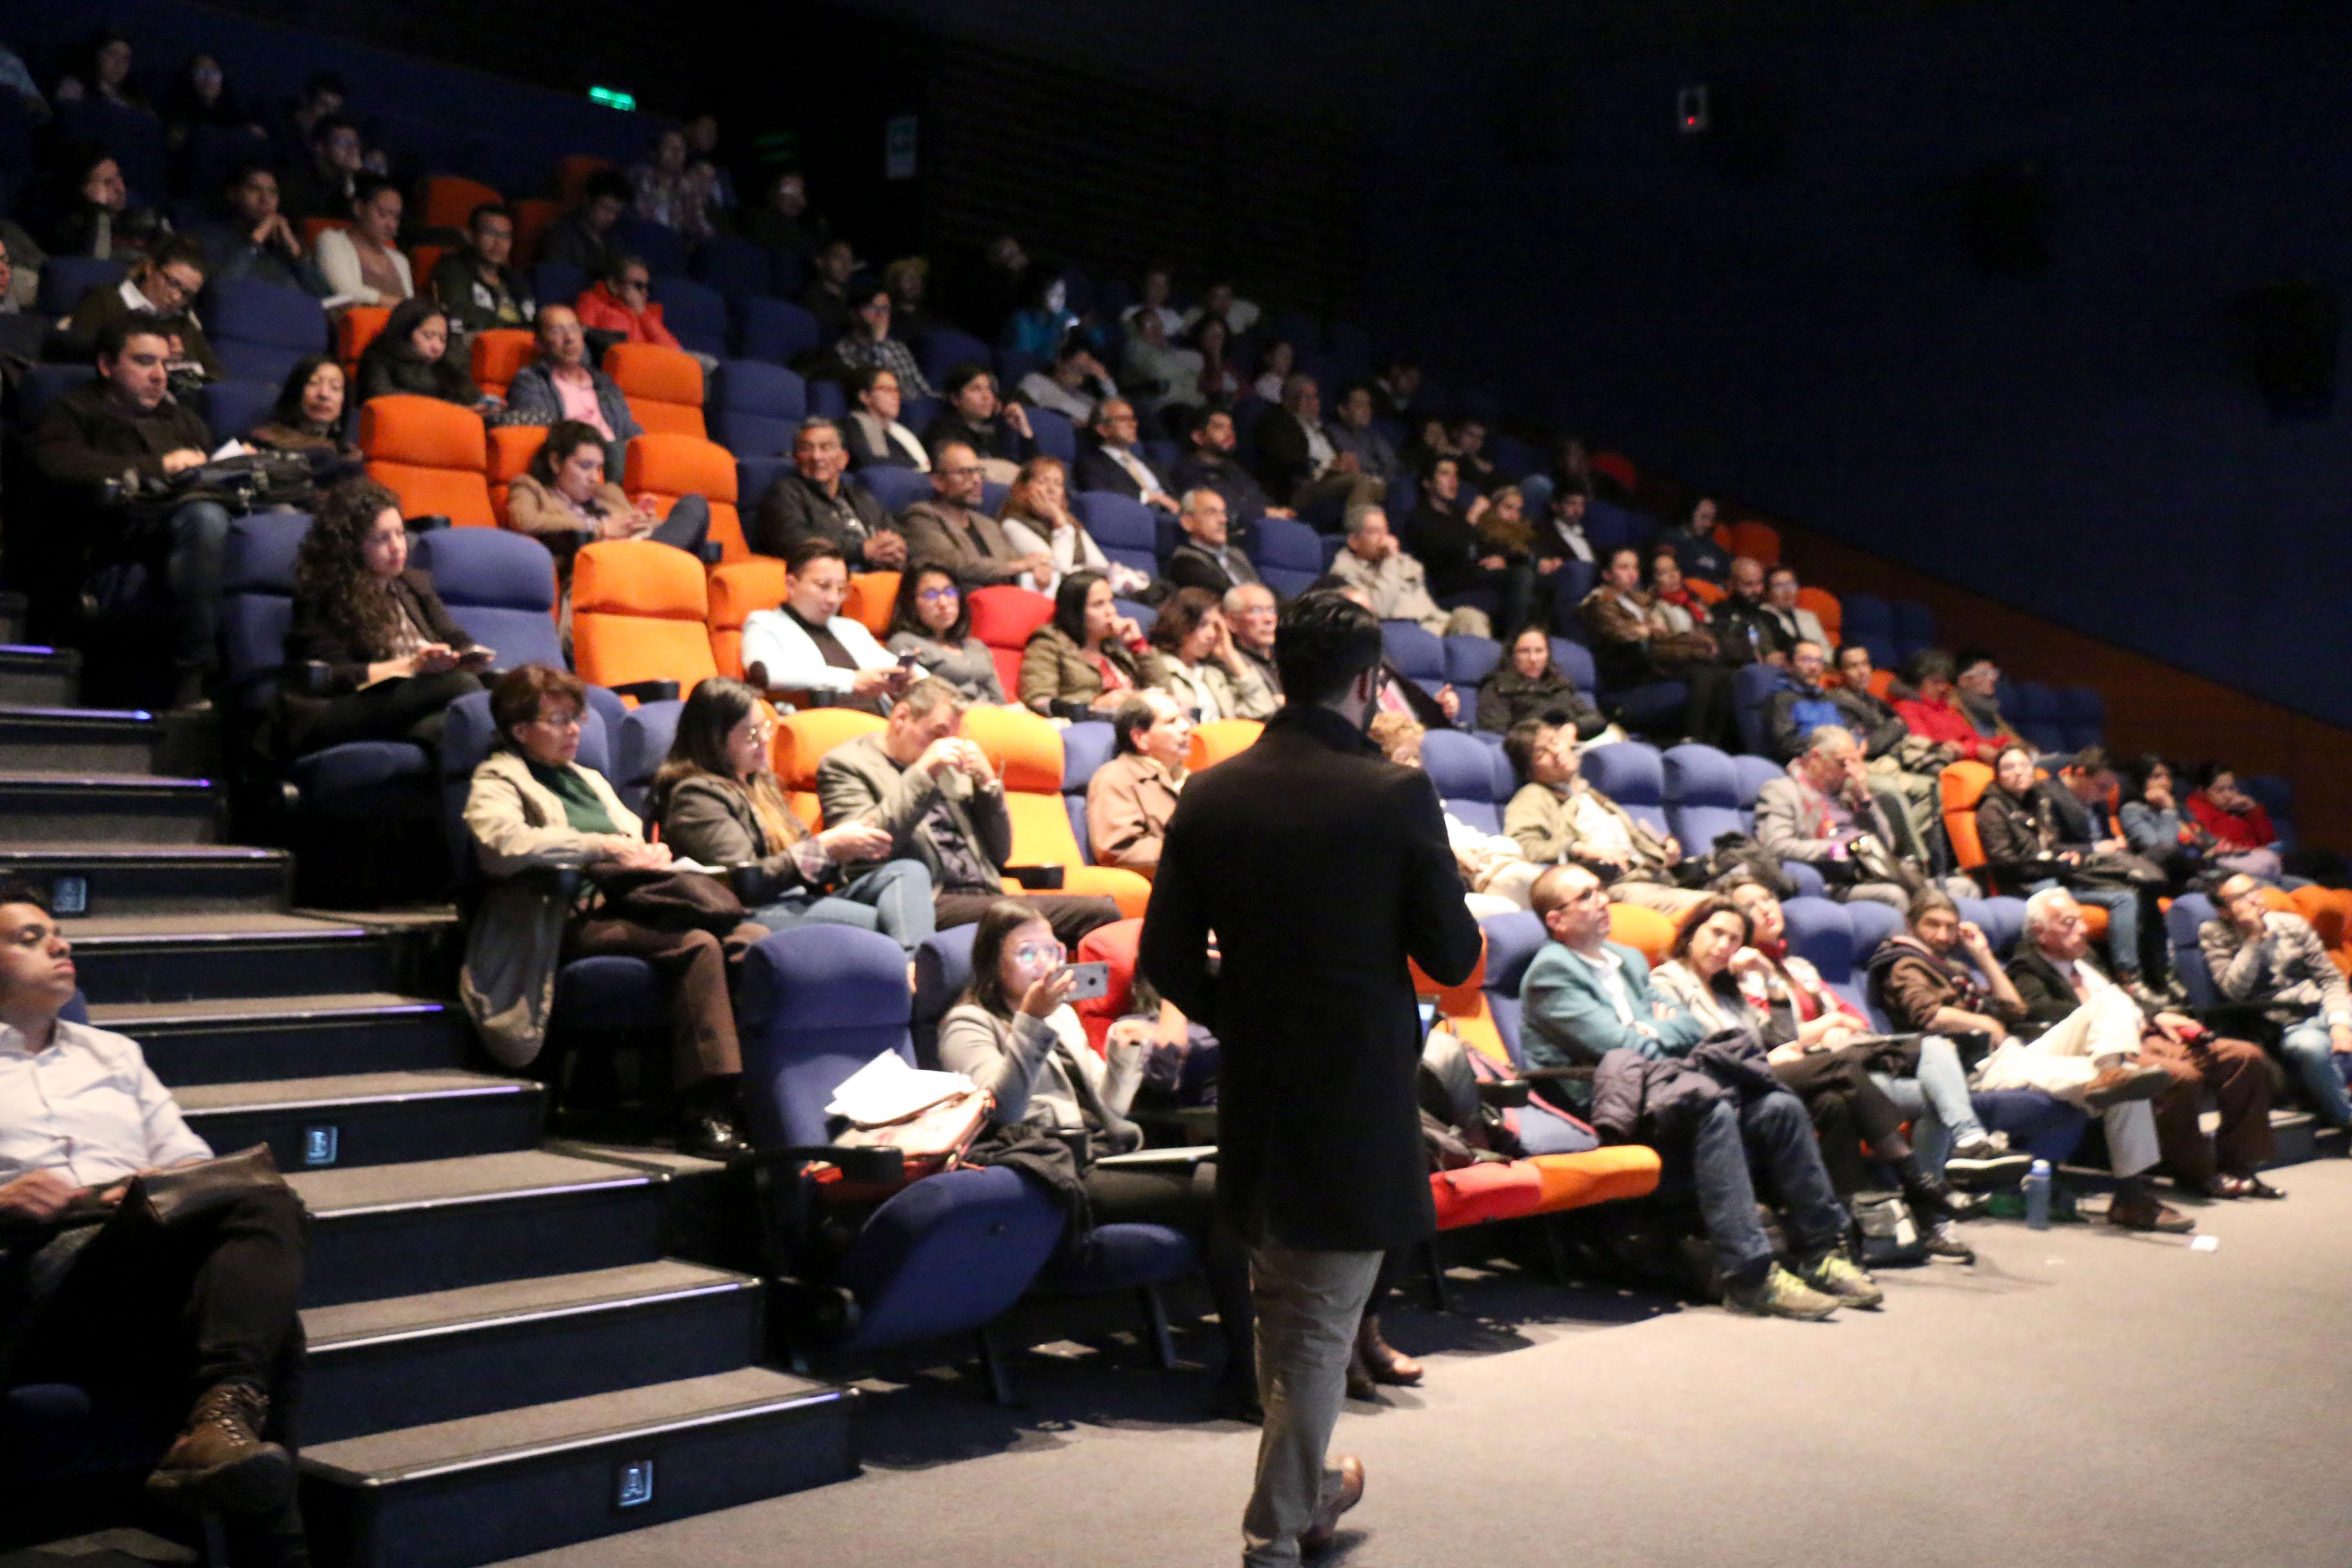 Profesor Miguel Silva en Cátedra Mundo Urbano / Foro Ricardo Salamanca